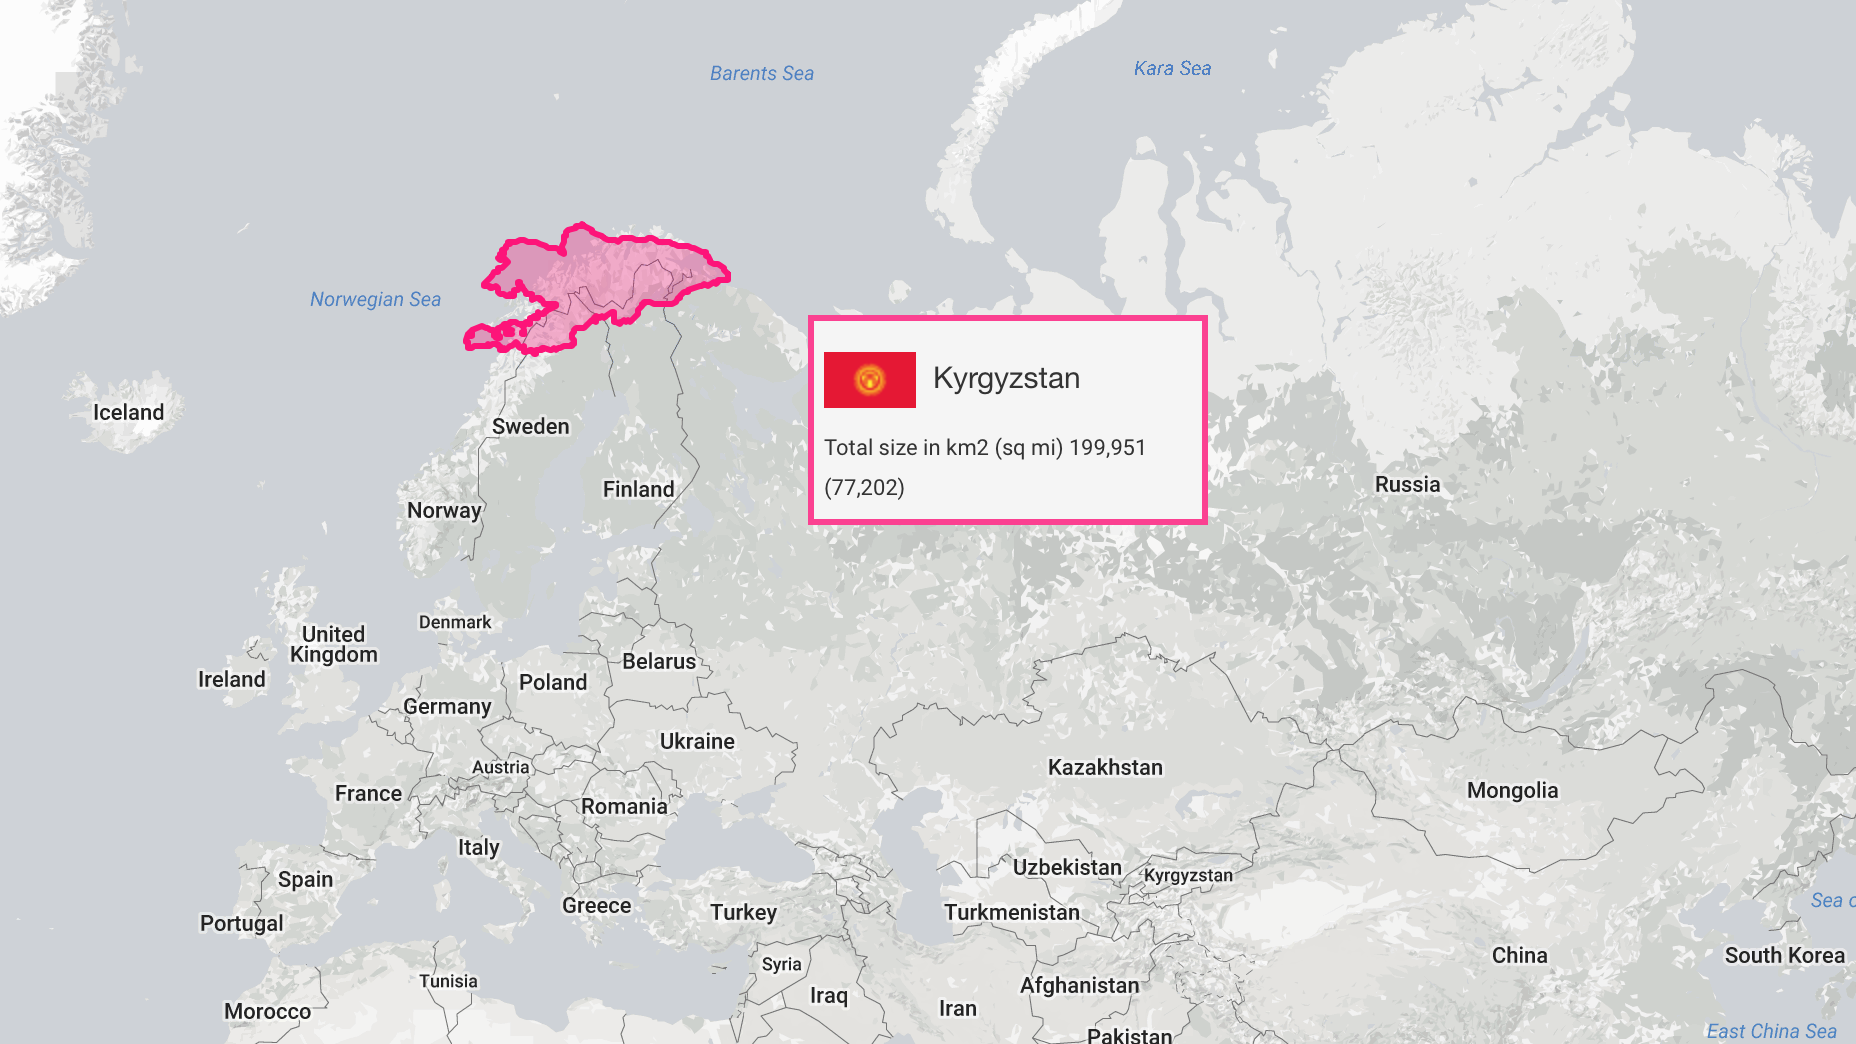 Kyrgyzstan_in_Finland